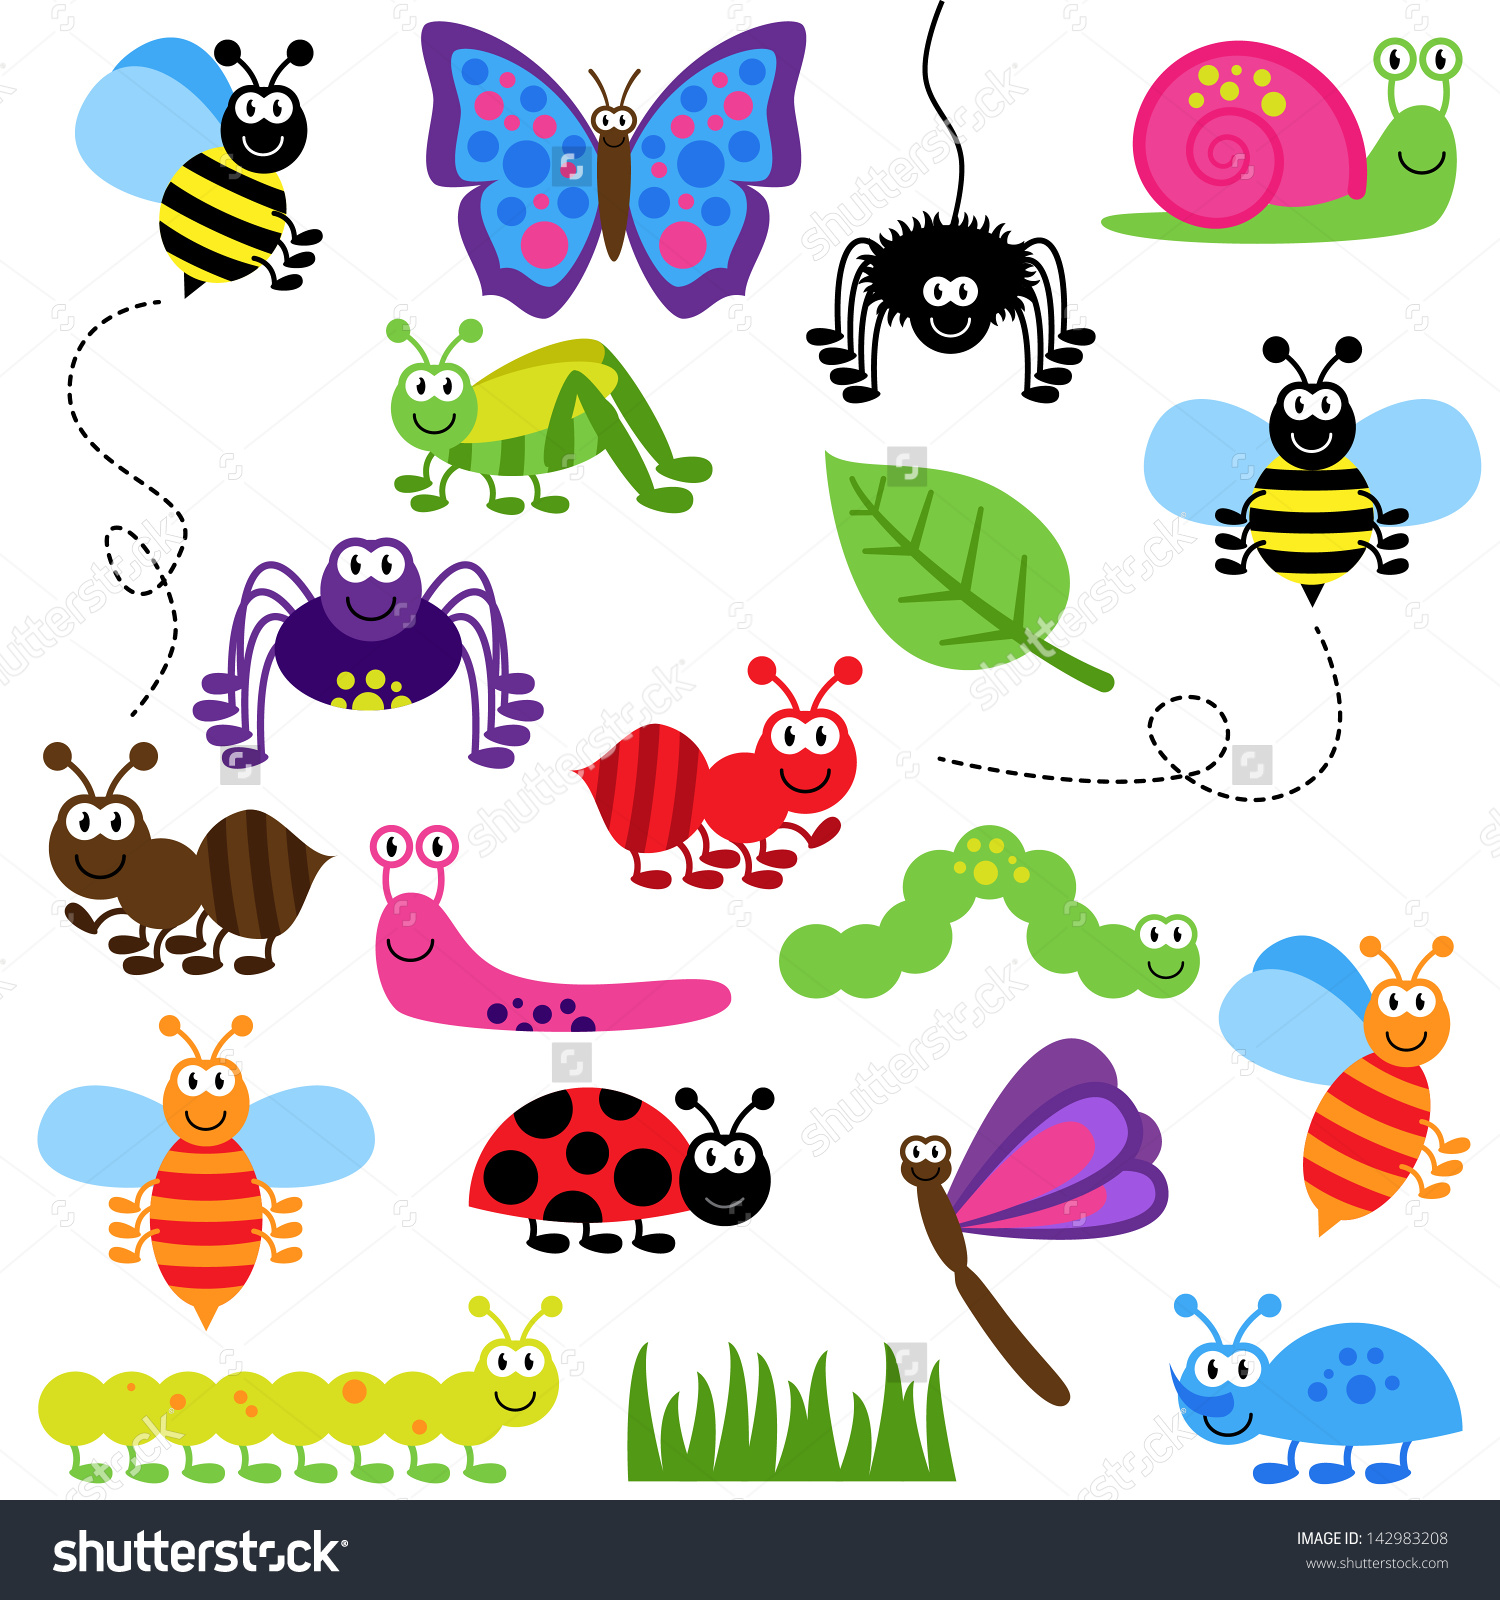 Garden creatures clipart.